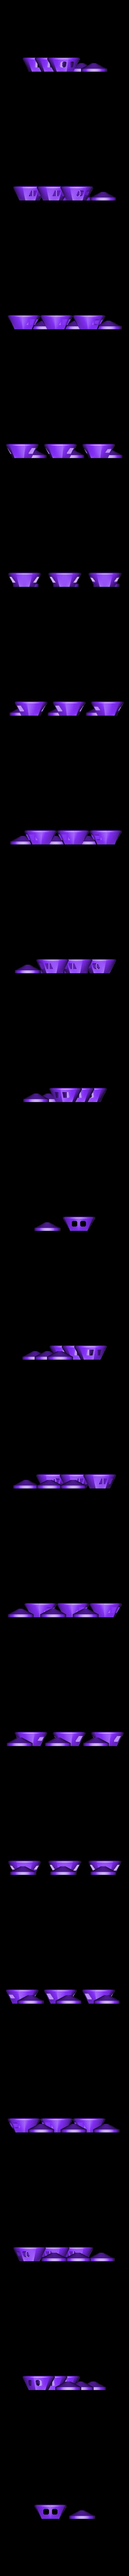 Lazy_Light_Pulley_3UP.stl Download free STL file Lazy Light System • Design to 3D print, 3DBROOKLYN